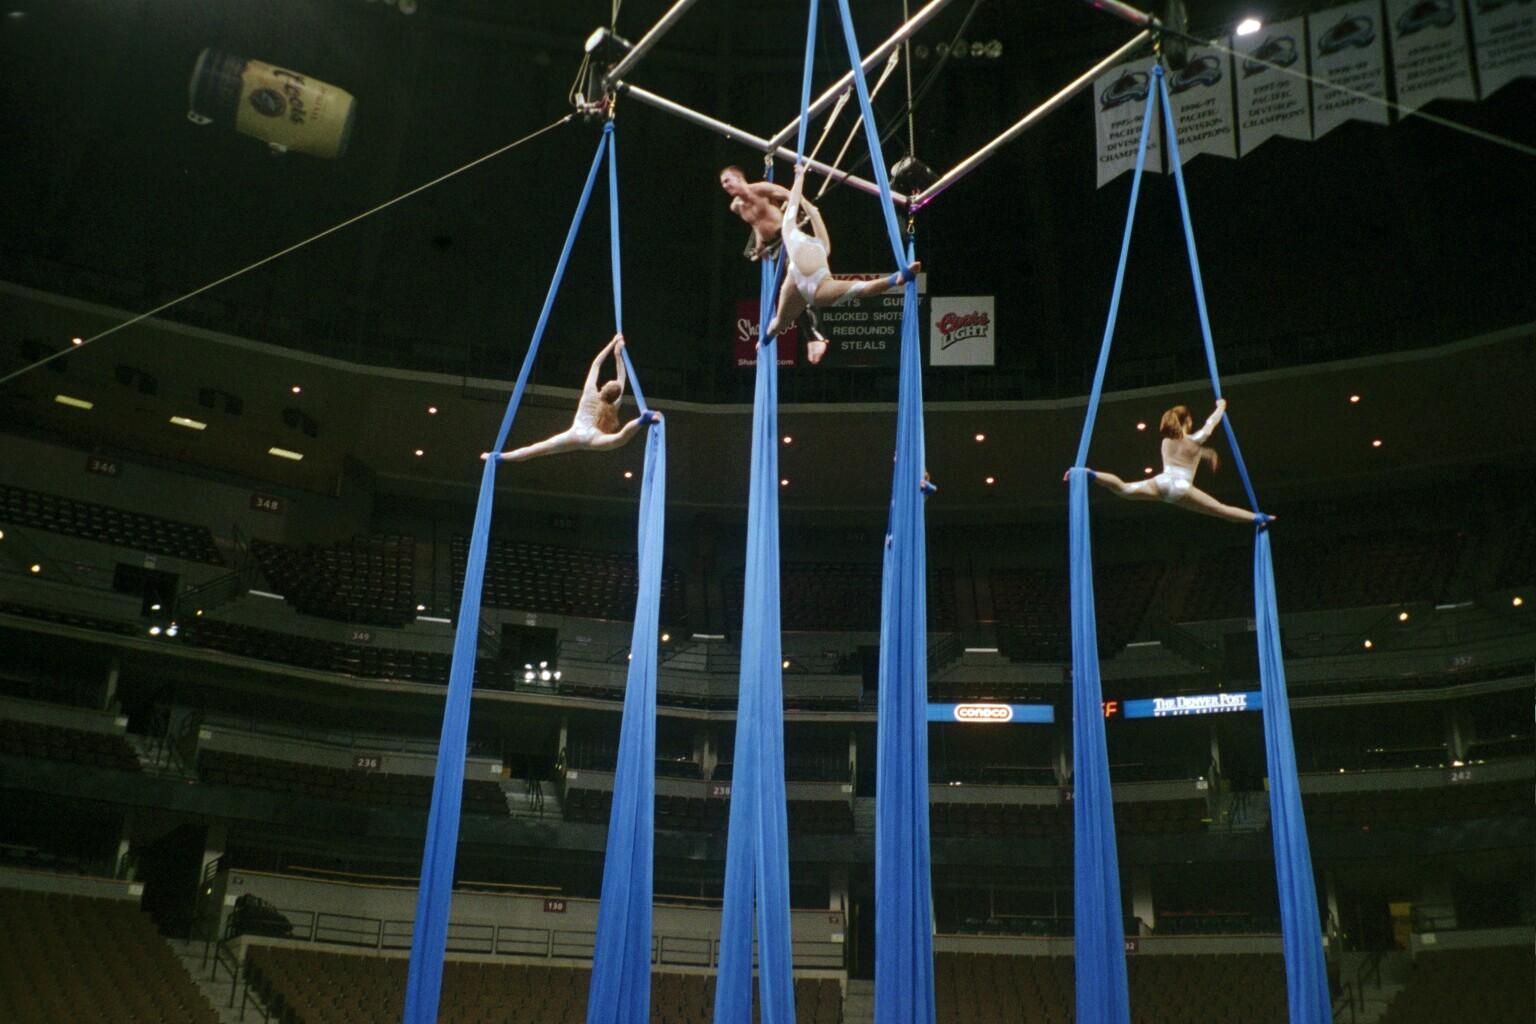 Pepsi Center show